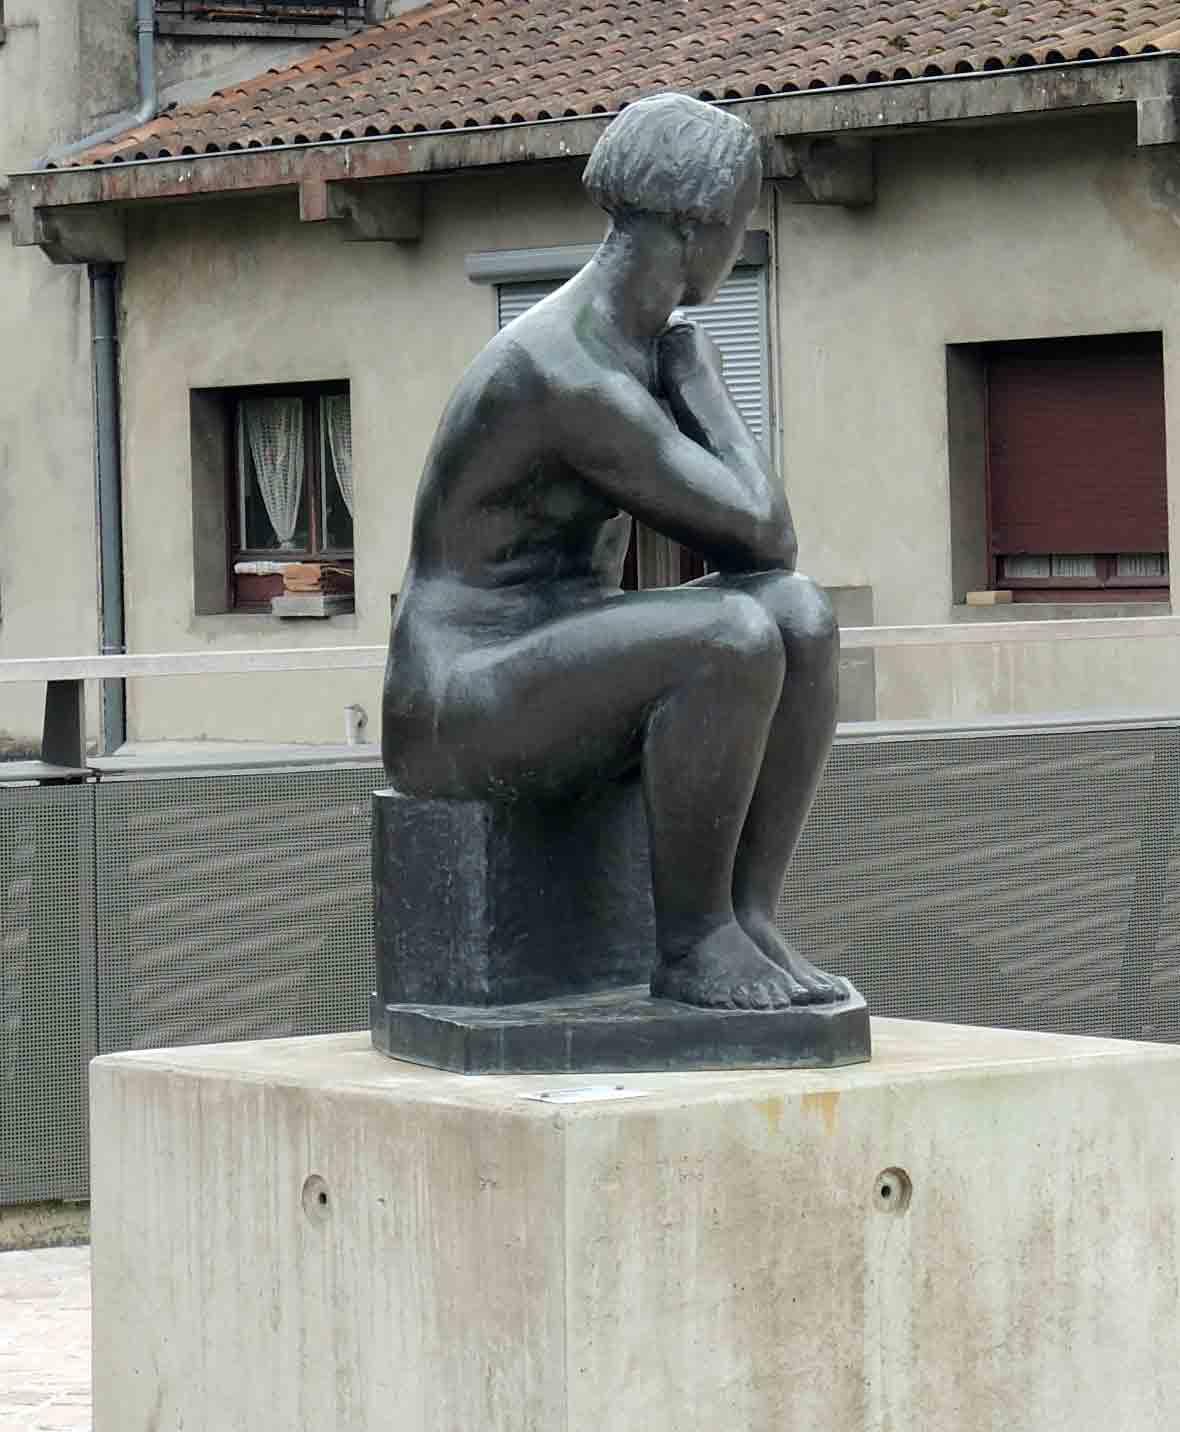 https://static.blog4ever.com/2015/09/808576/DSCN6641_mont-de-marsan-statue-charles-despiaux_phot-r1c1w1.jpg